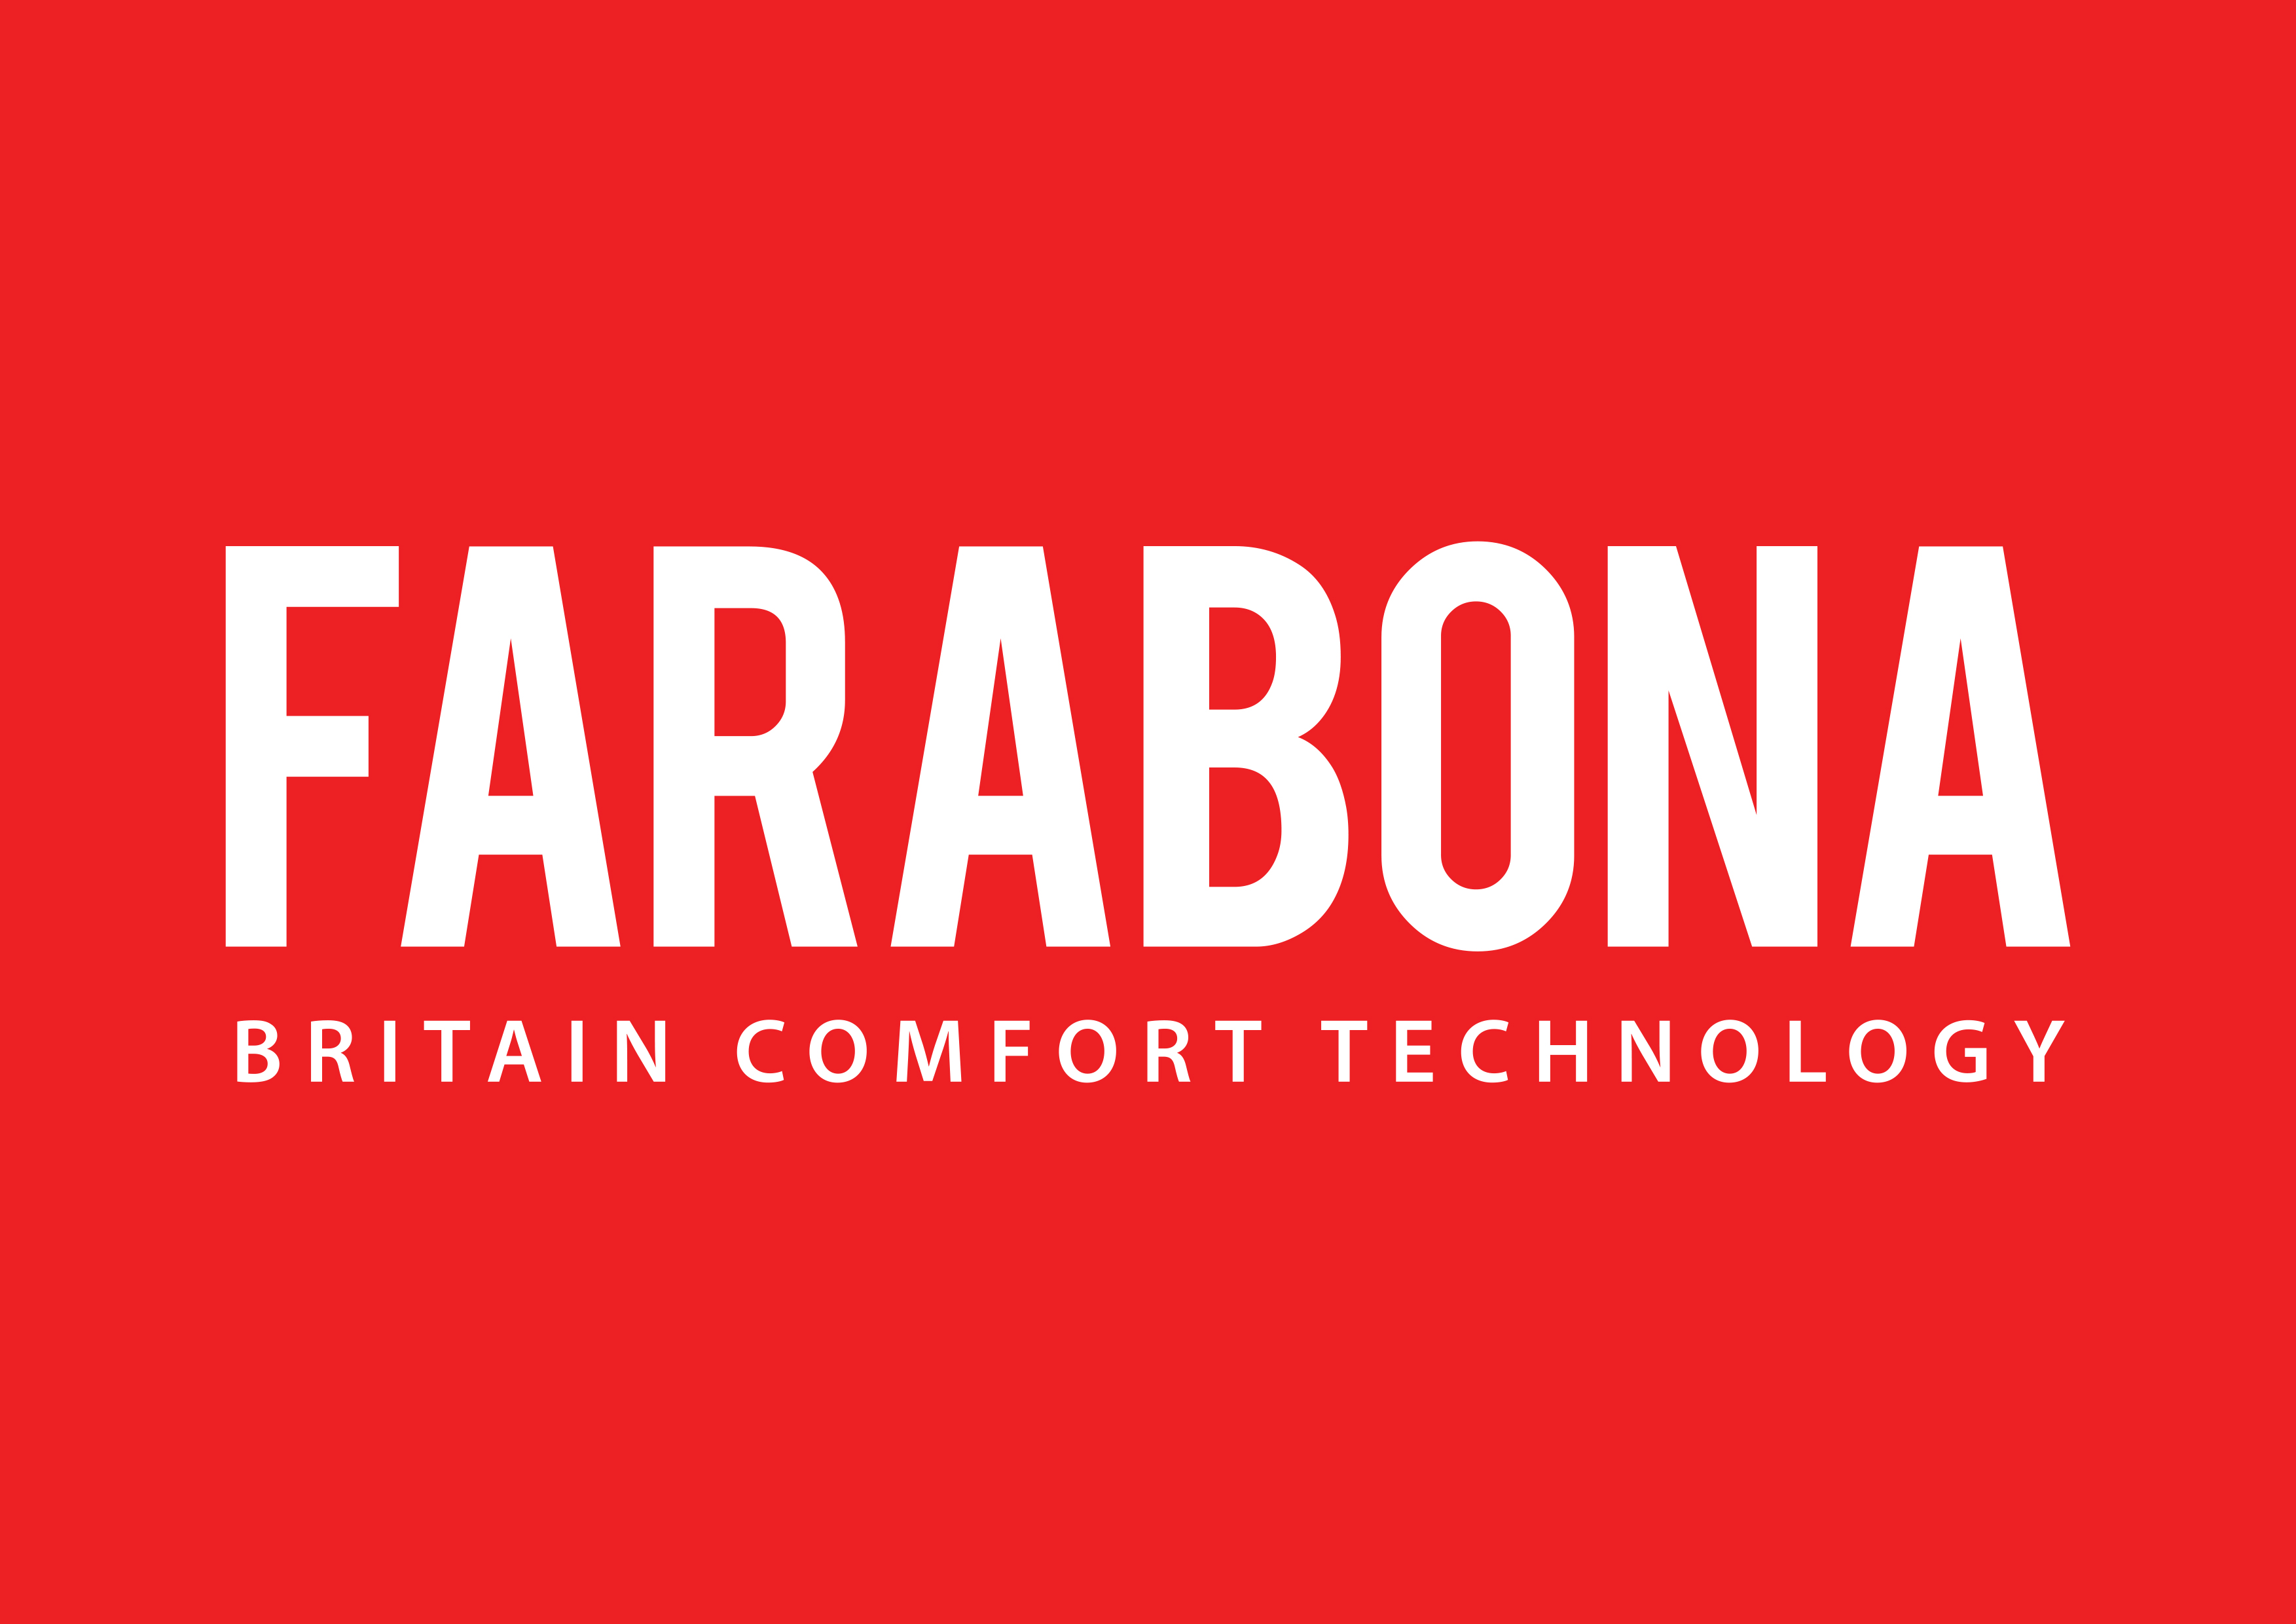 Farabona